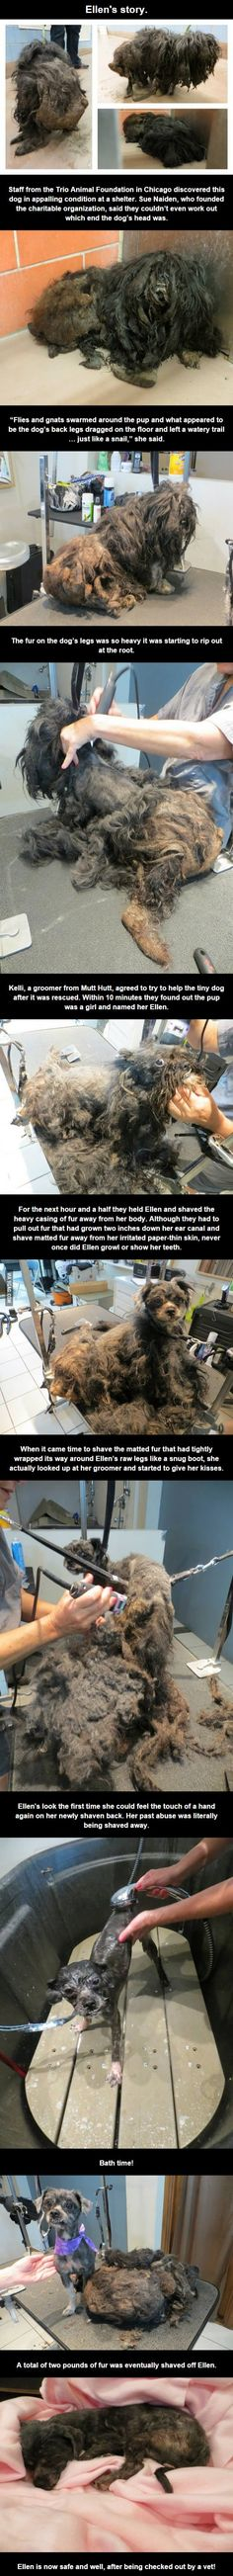 Ellen's Story: Horrible and Heartwarming